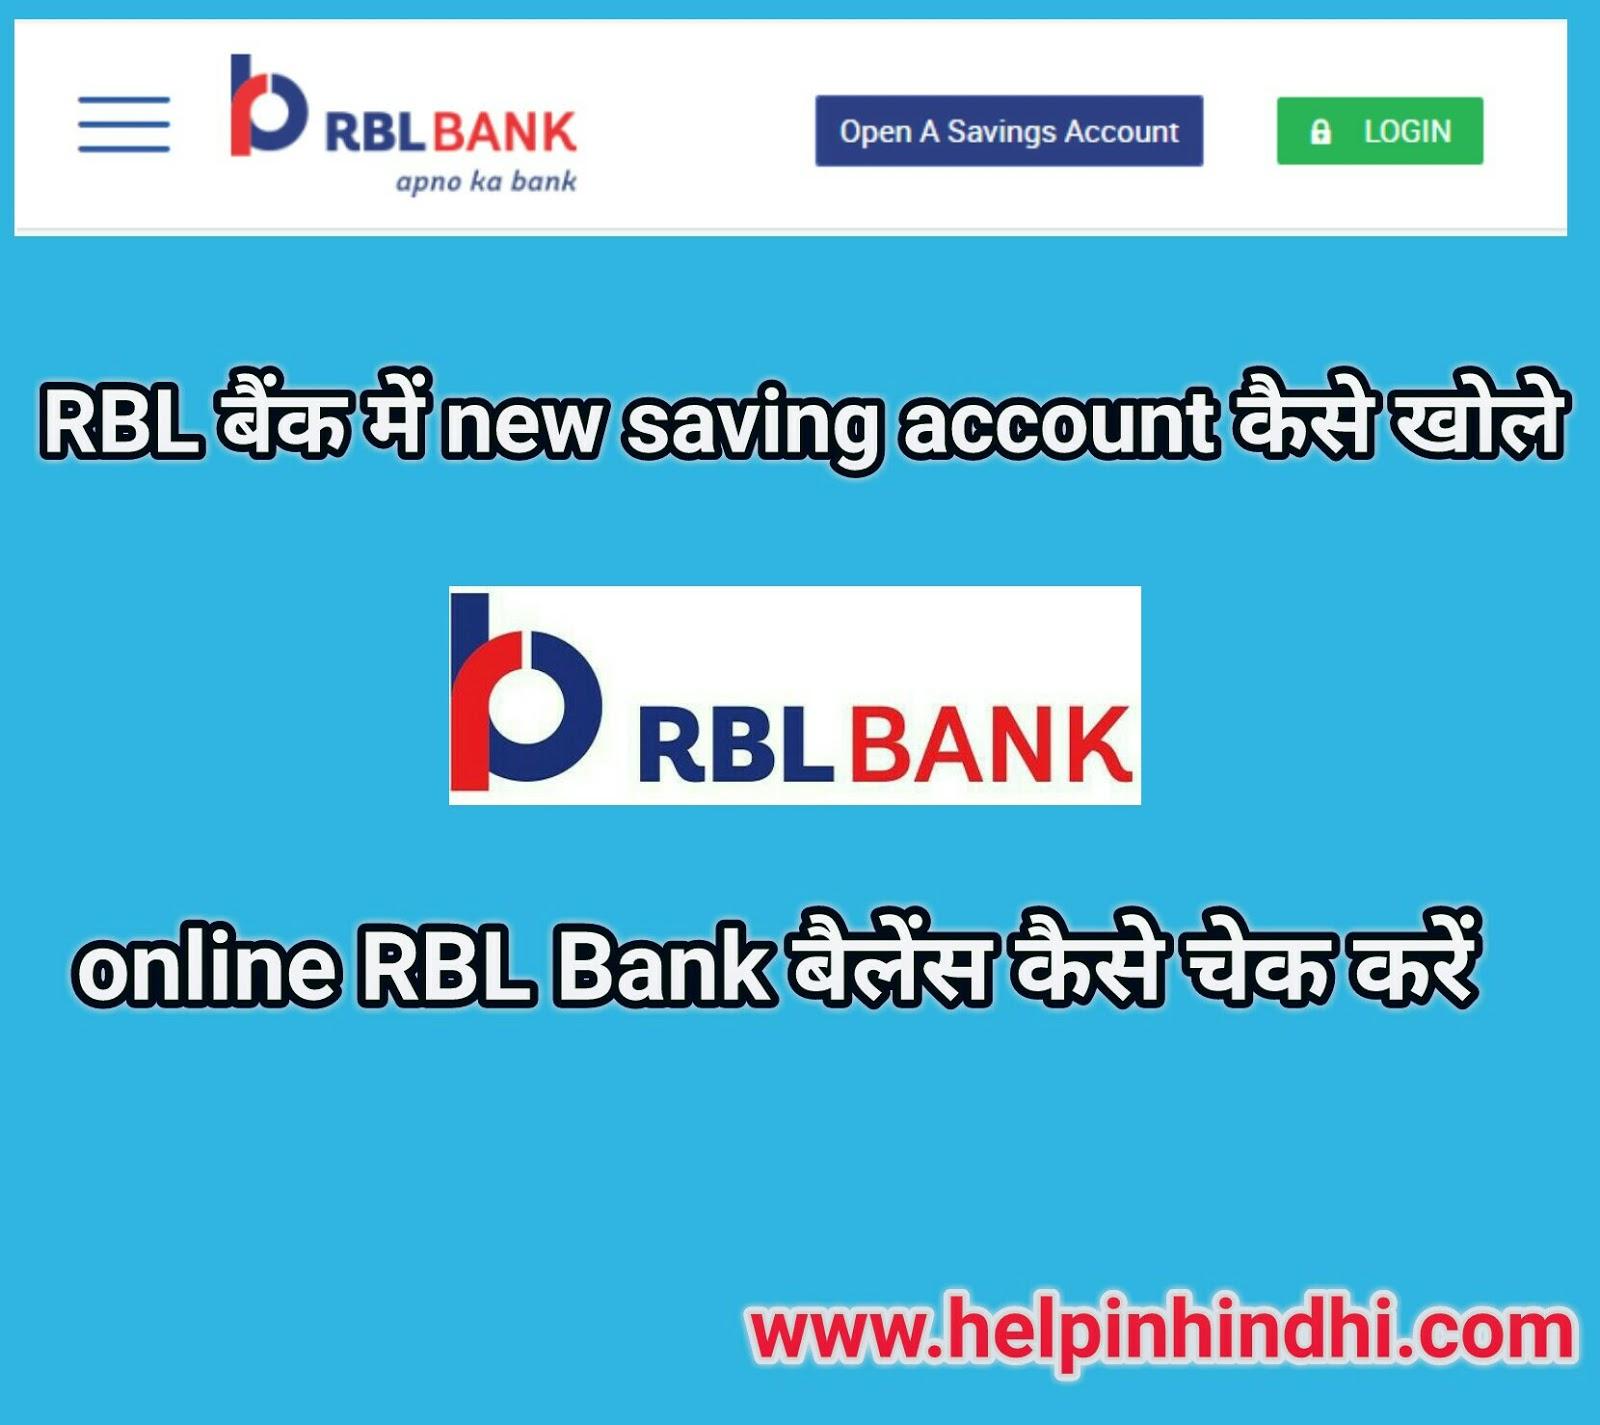 Rbl ब क म ख त एक उ ट क स ख ल Rbl Bank Me Online Account Kaise Khole Rbl Bank Ka Online Balance Kaise Check Kare Help In Hindhi